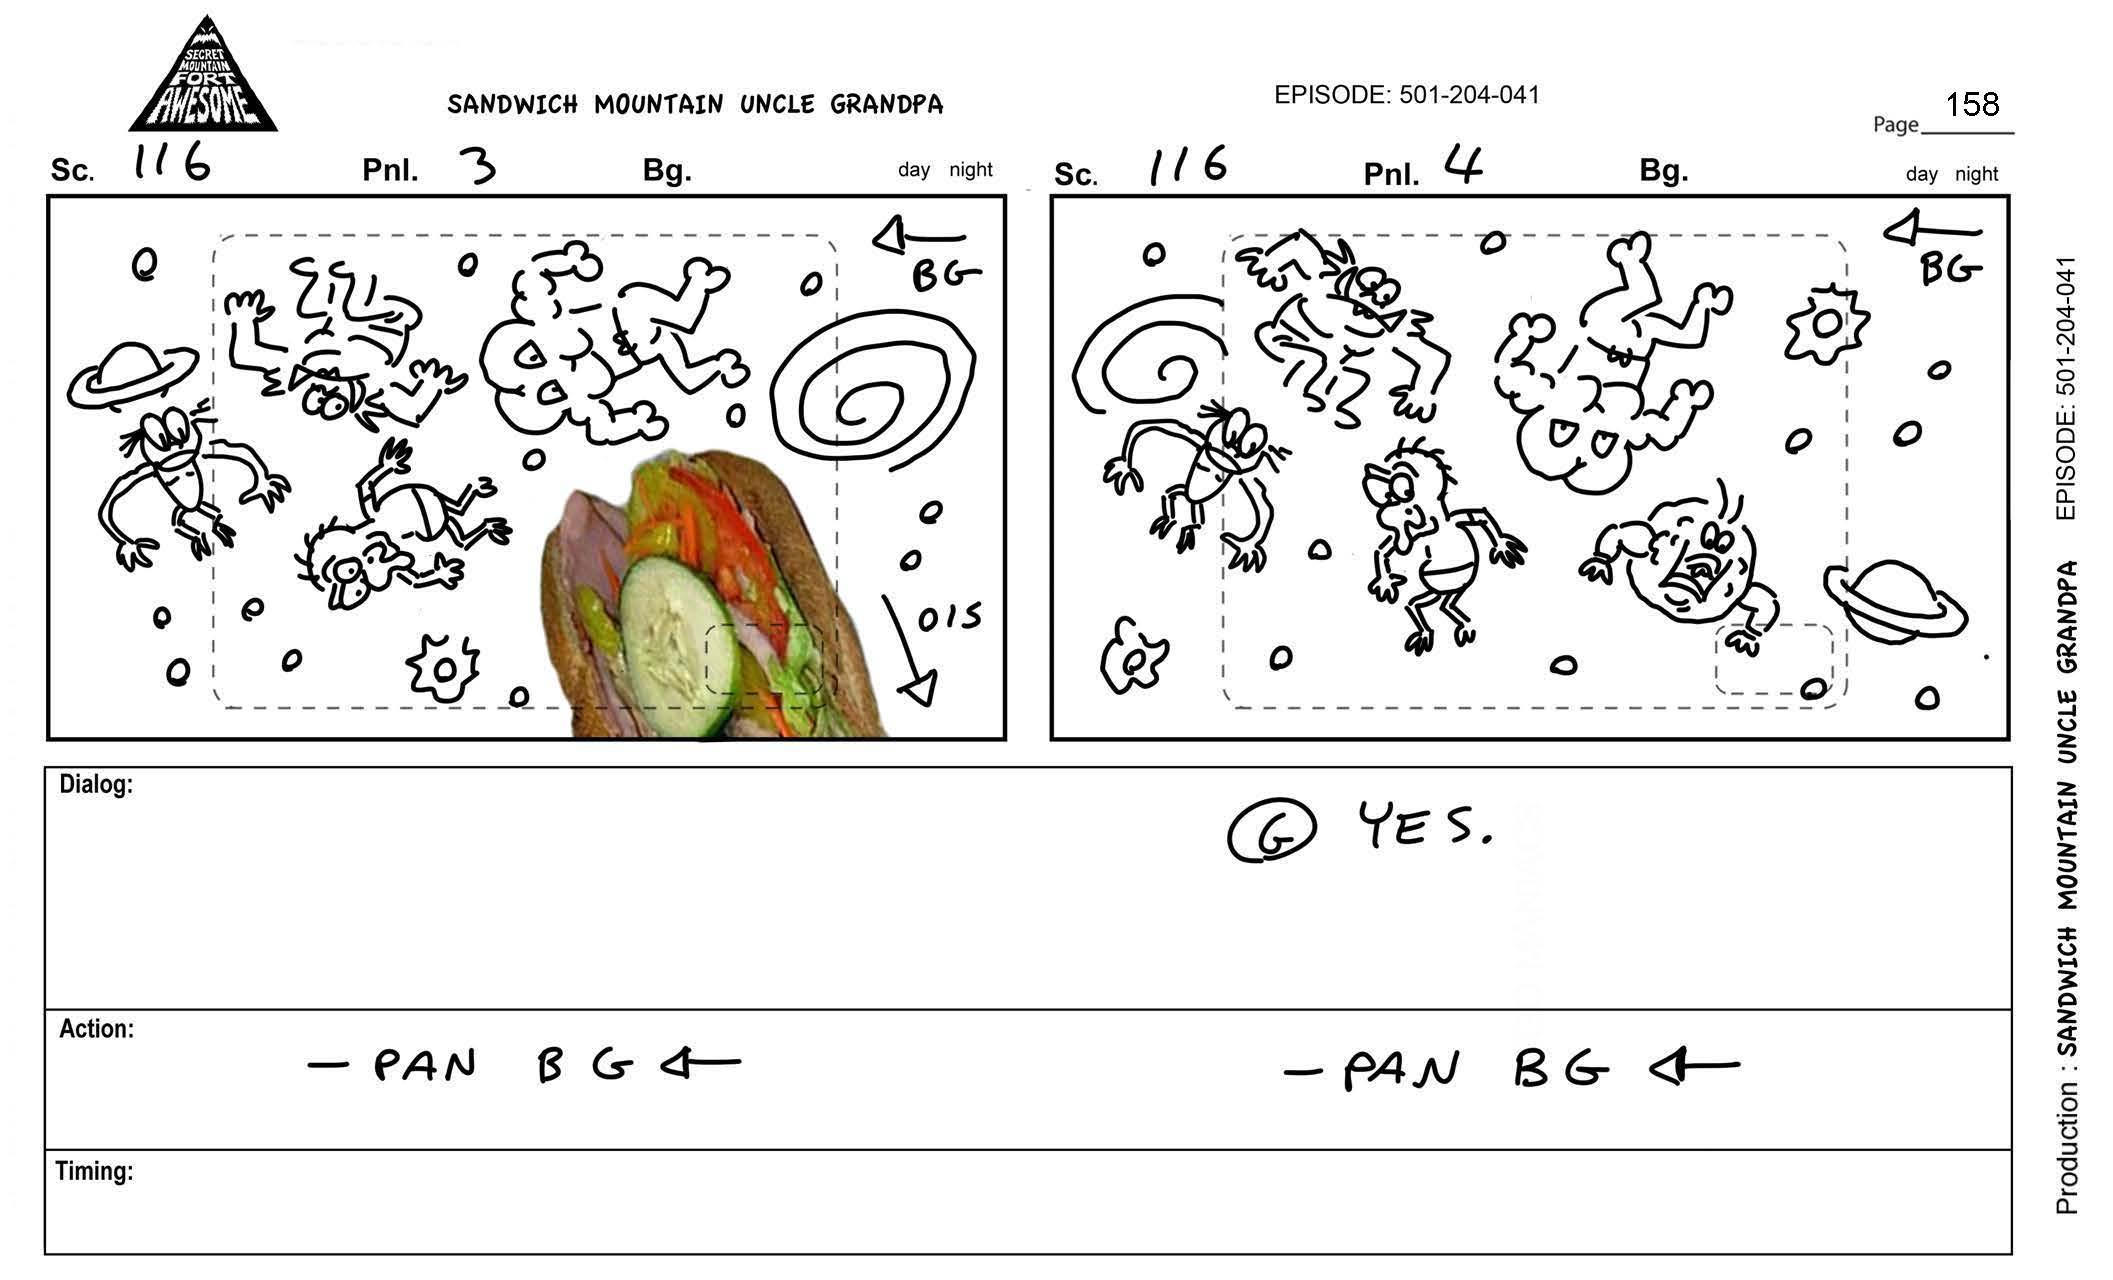 SMFA_SandwichMountainUncleGrandpa_Page_158.jpg